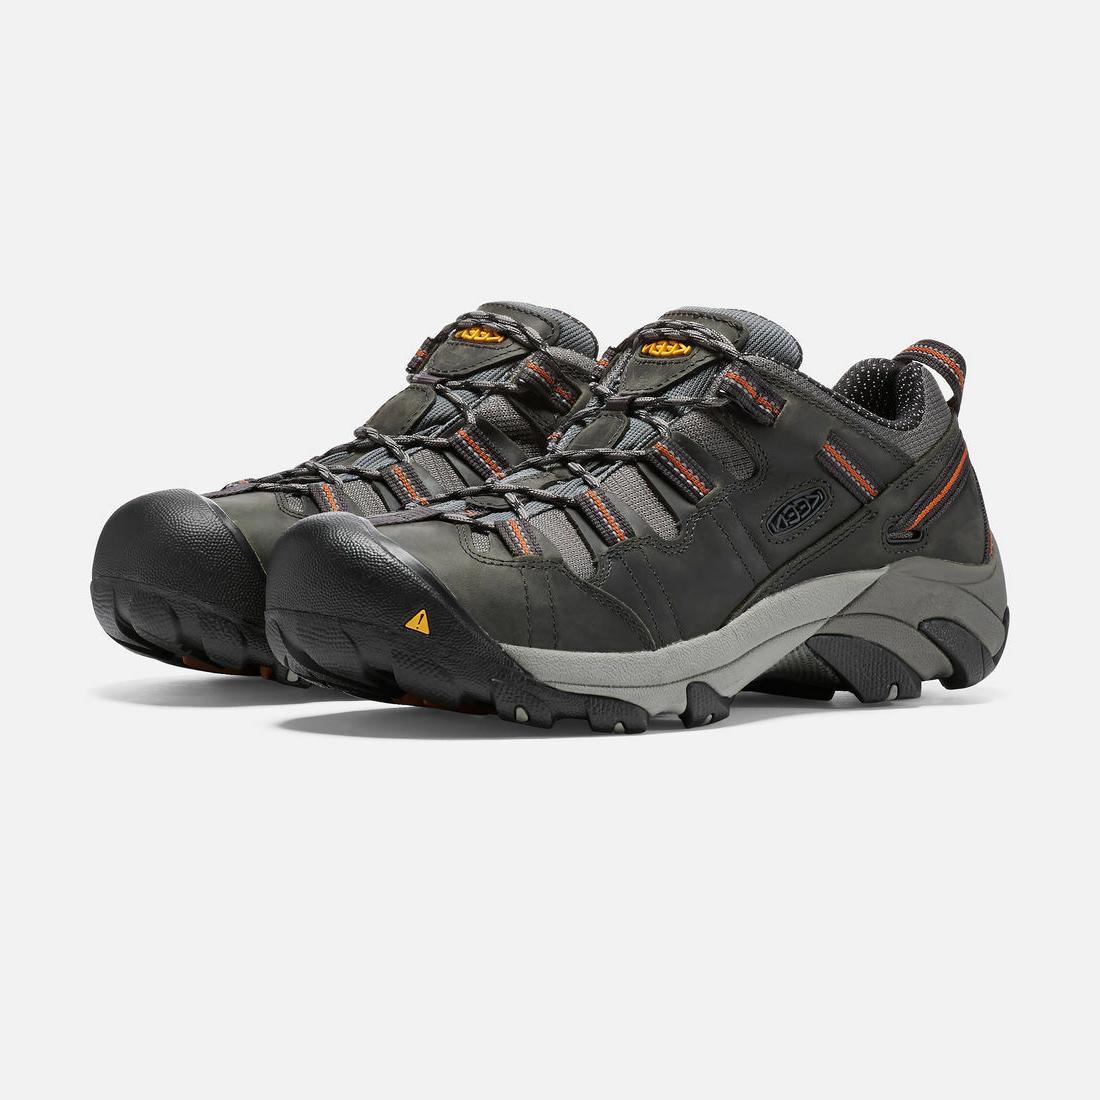 Men's Detroit Low 1007010 Steel Toe Peacoat / Grey 50% Great Buy